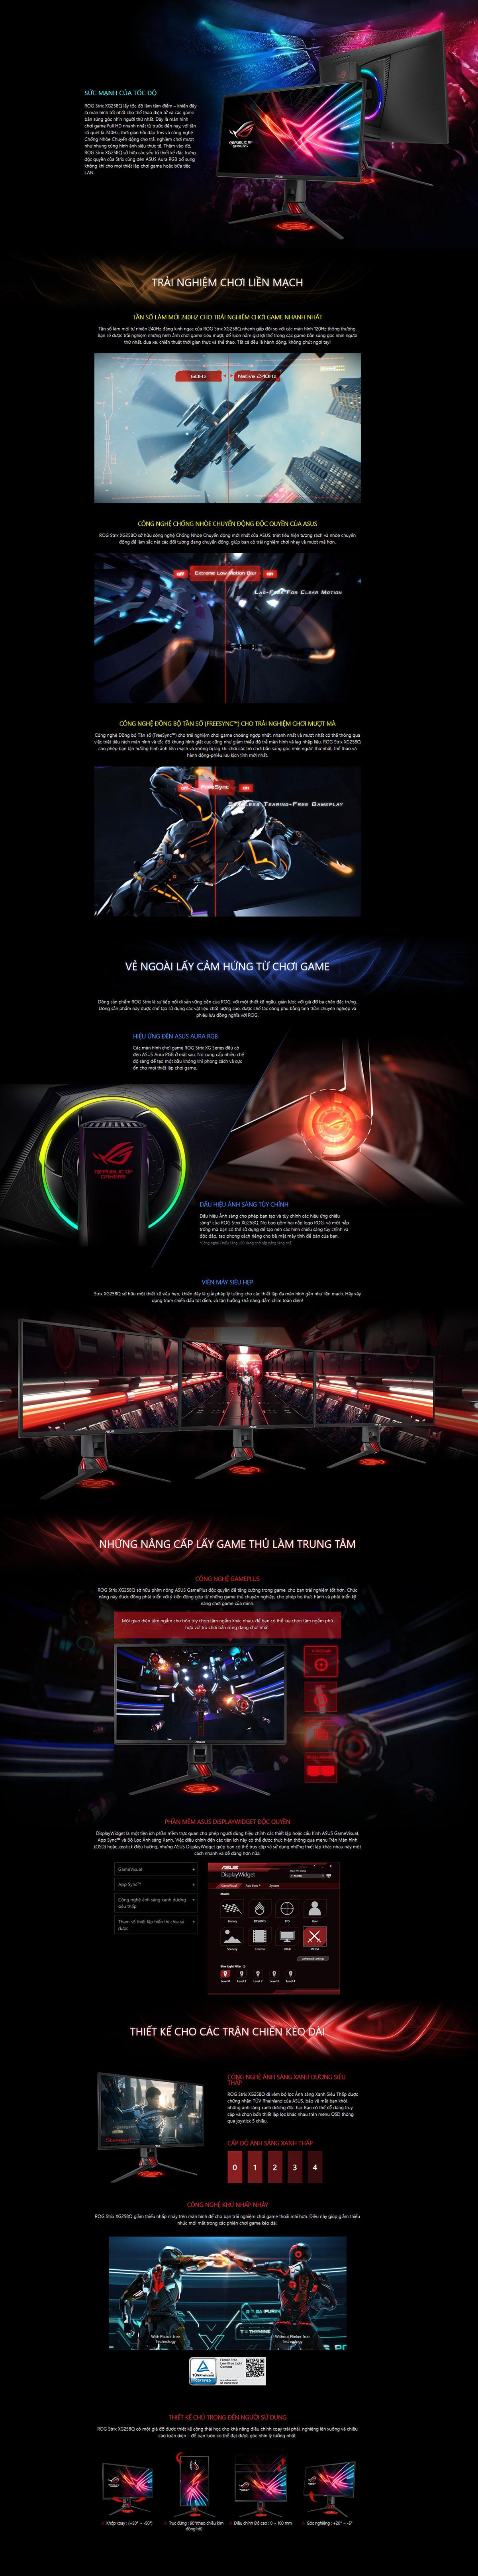 ASUS ROG Strix XG258Q Gaming Monitor Details